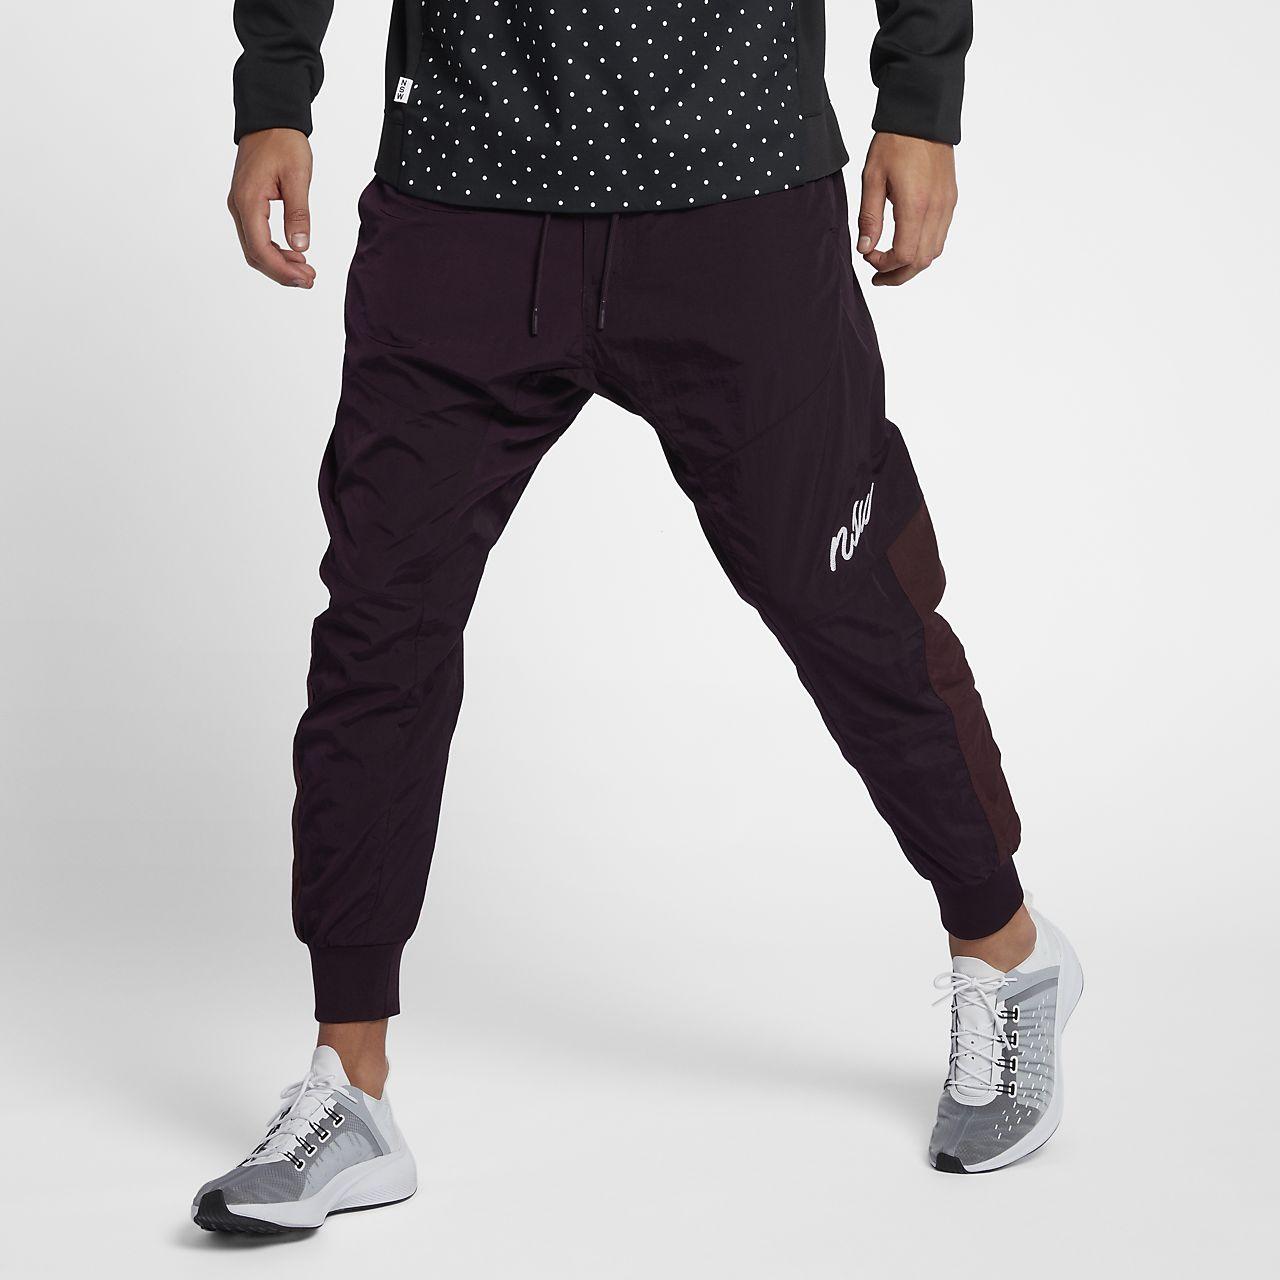 De Nsw Nike HommeBe Jogging Tissé Pour Pantalon Sportswear dCBQtshrx